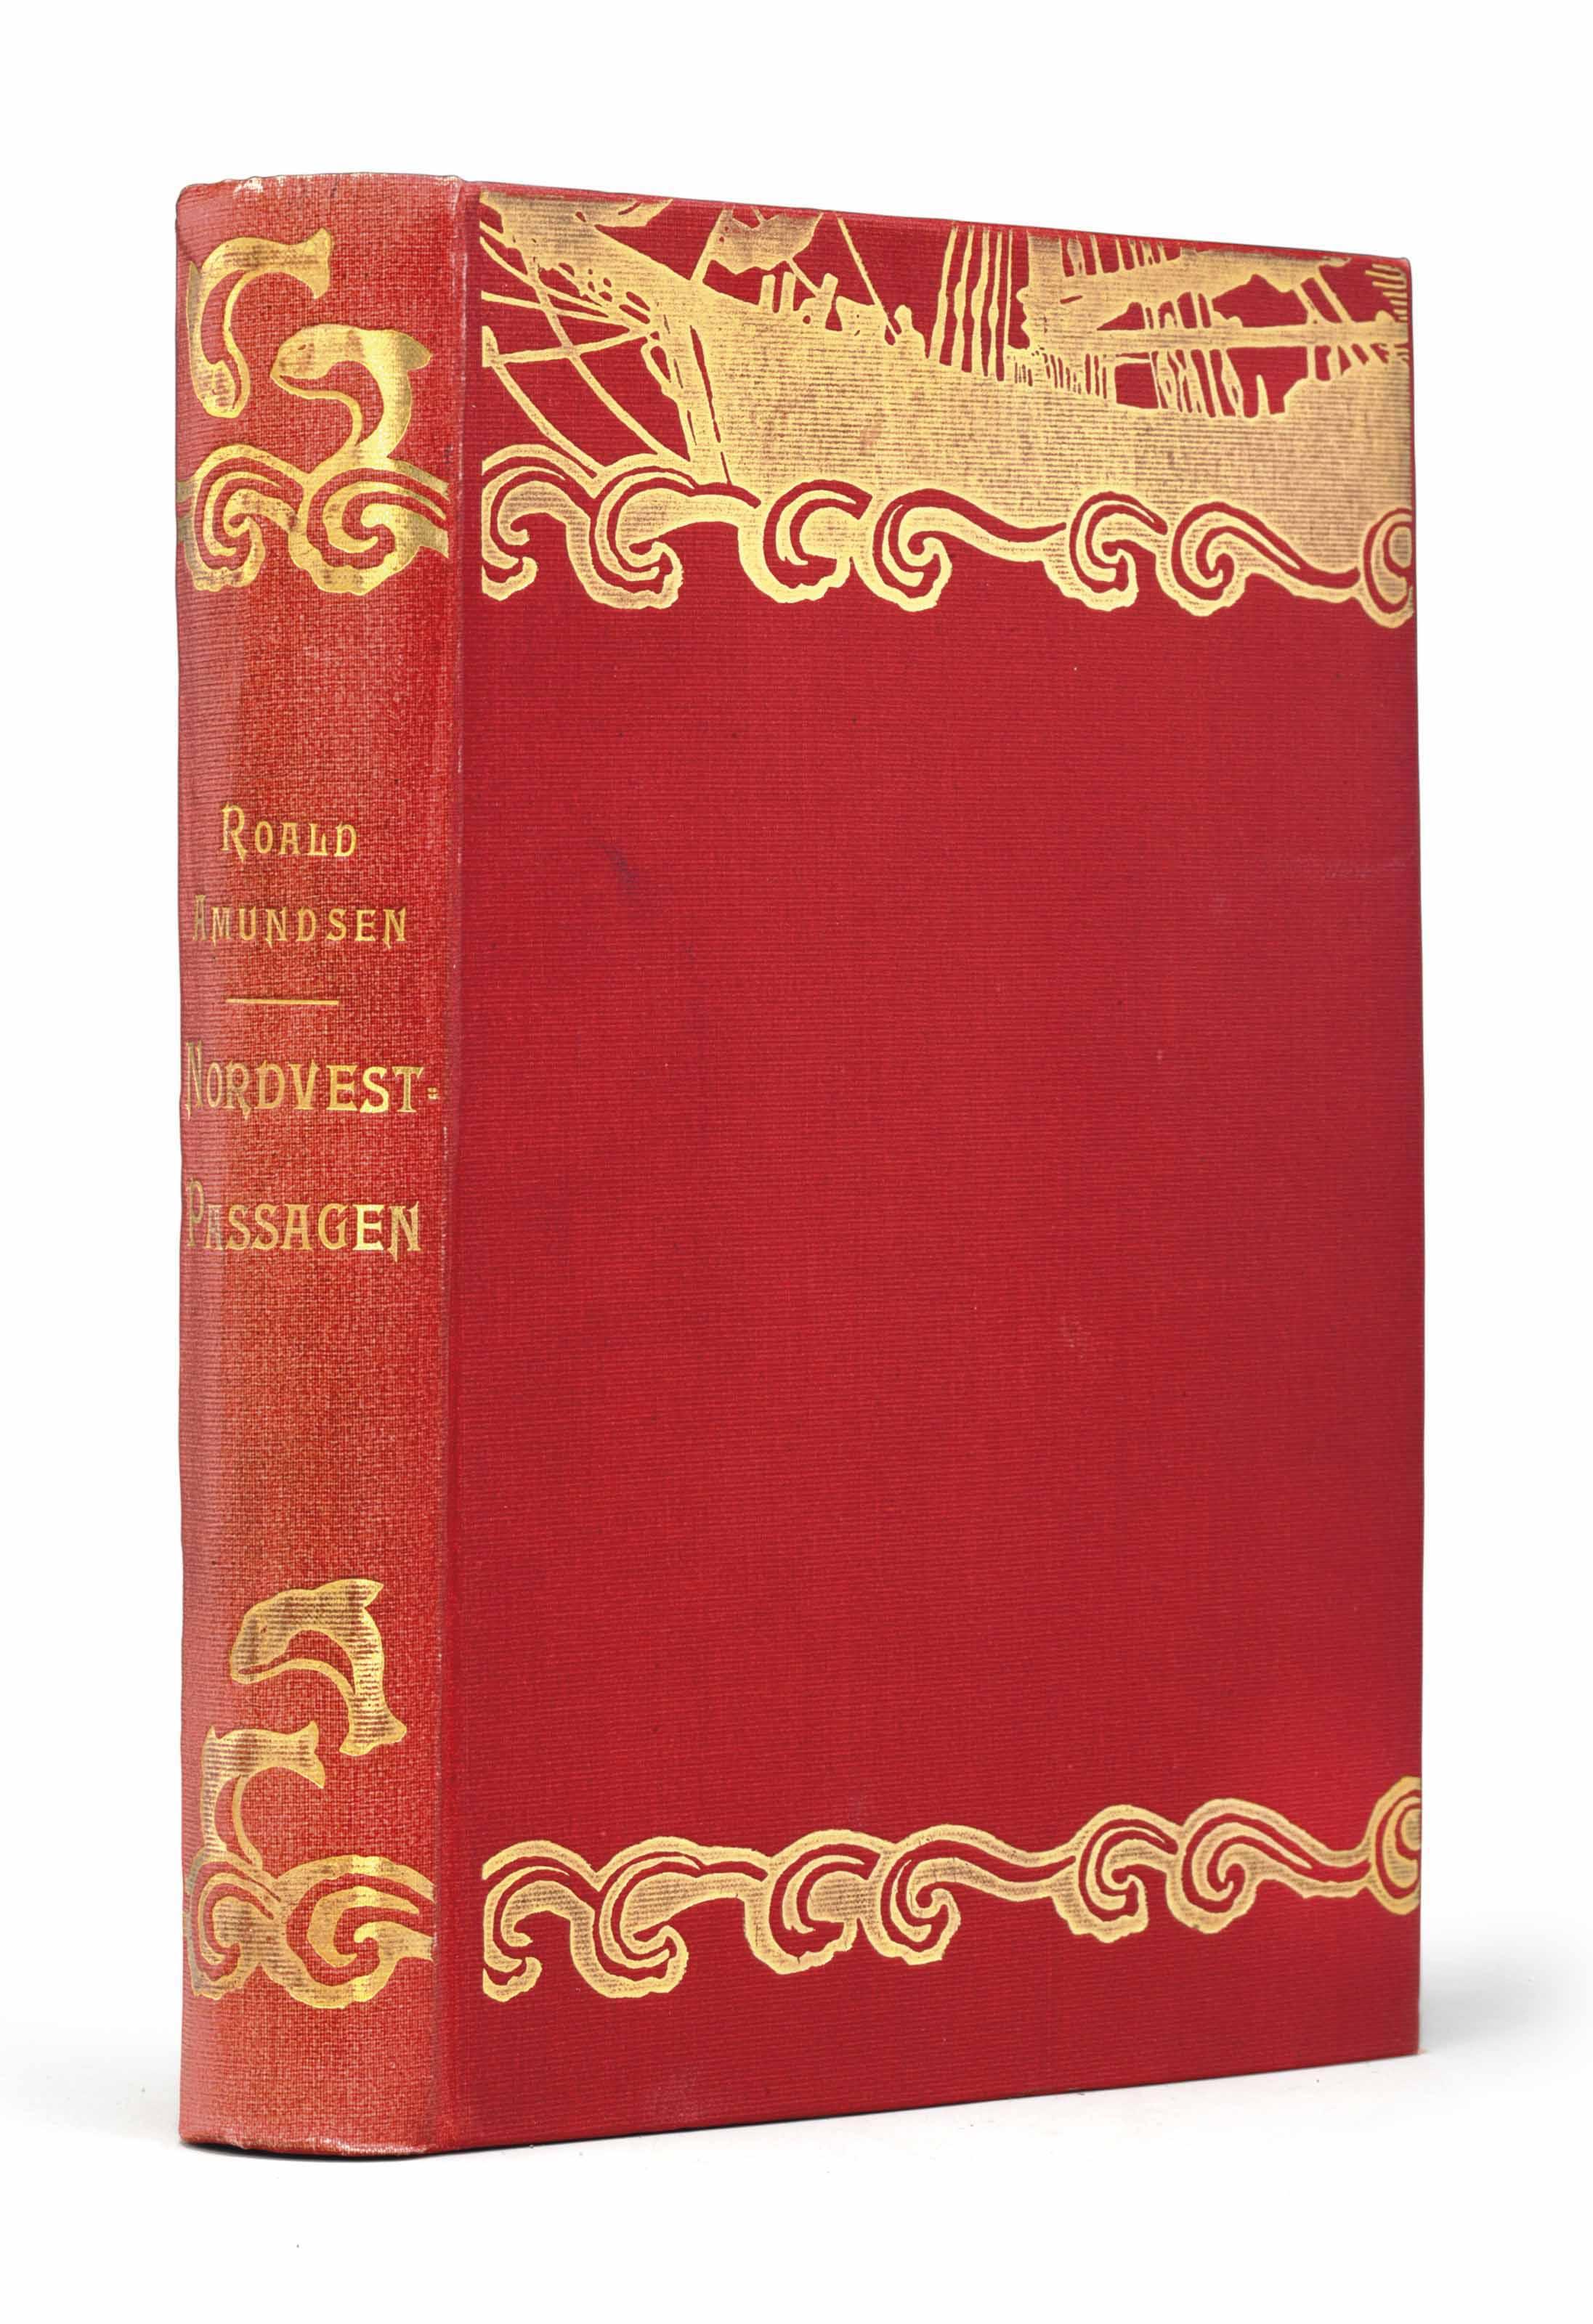 AMUNDSEN, Roald (1872-1928). N